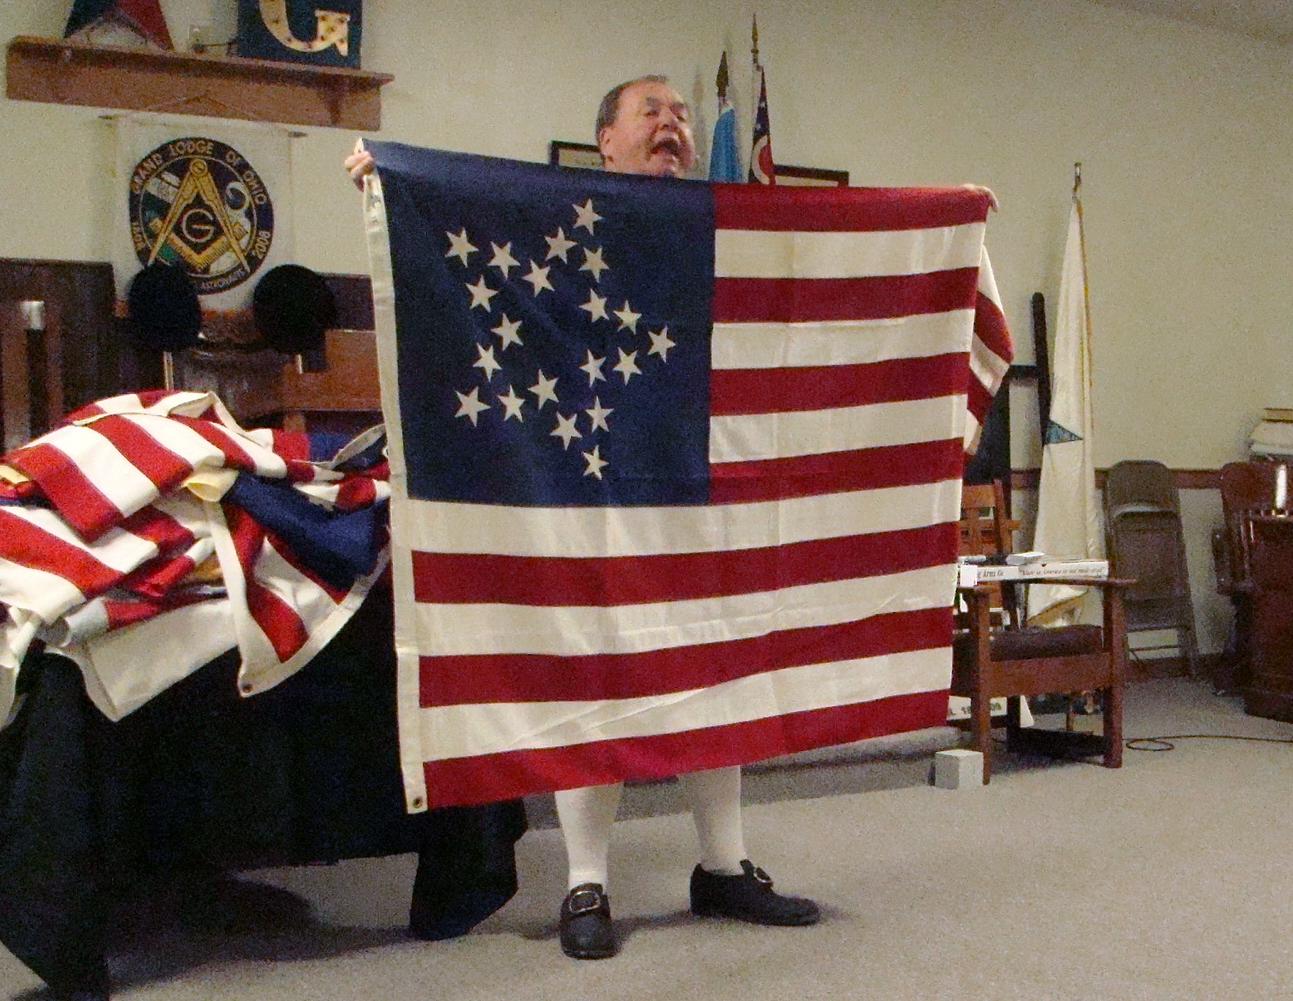 Vane Great Star Flag - 20 stars